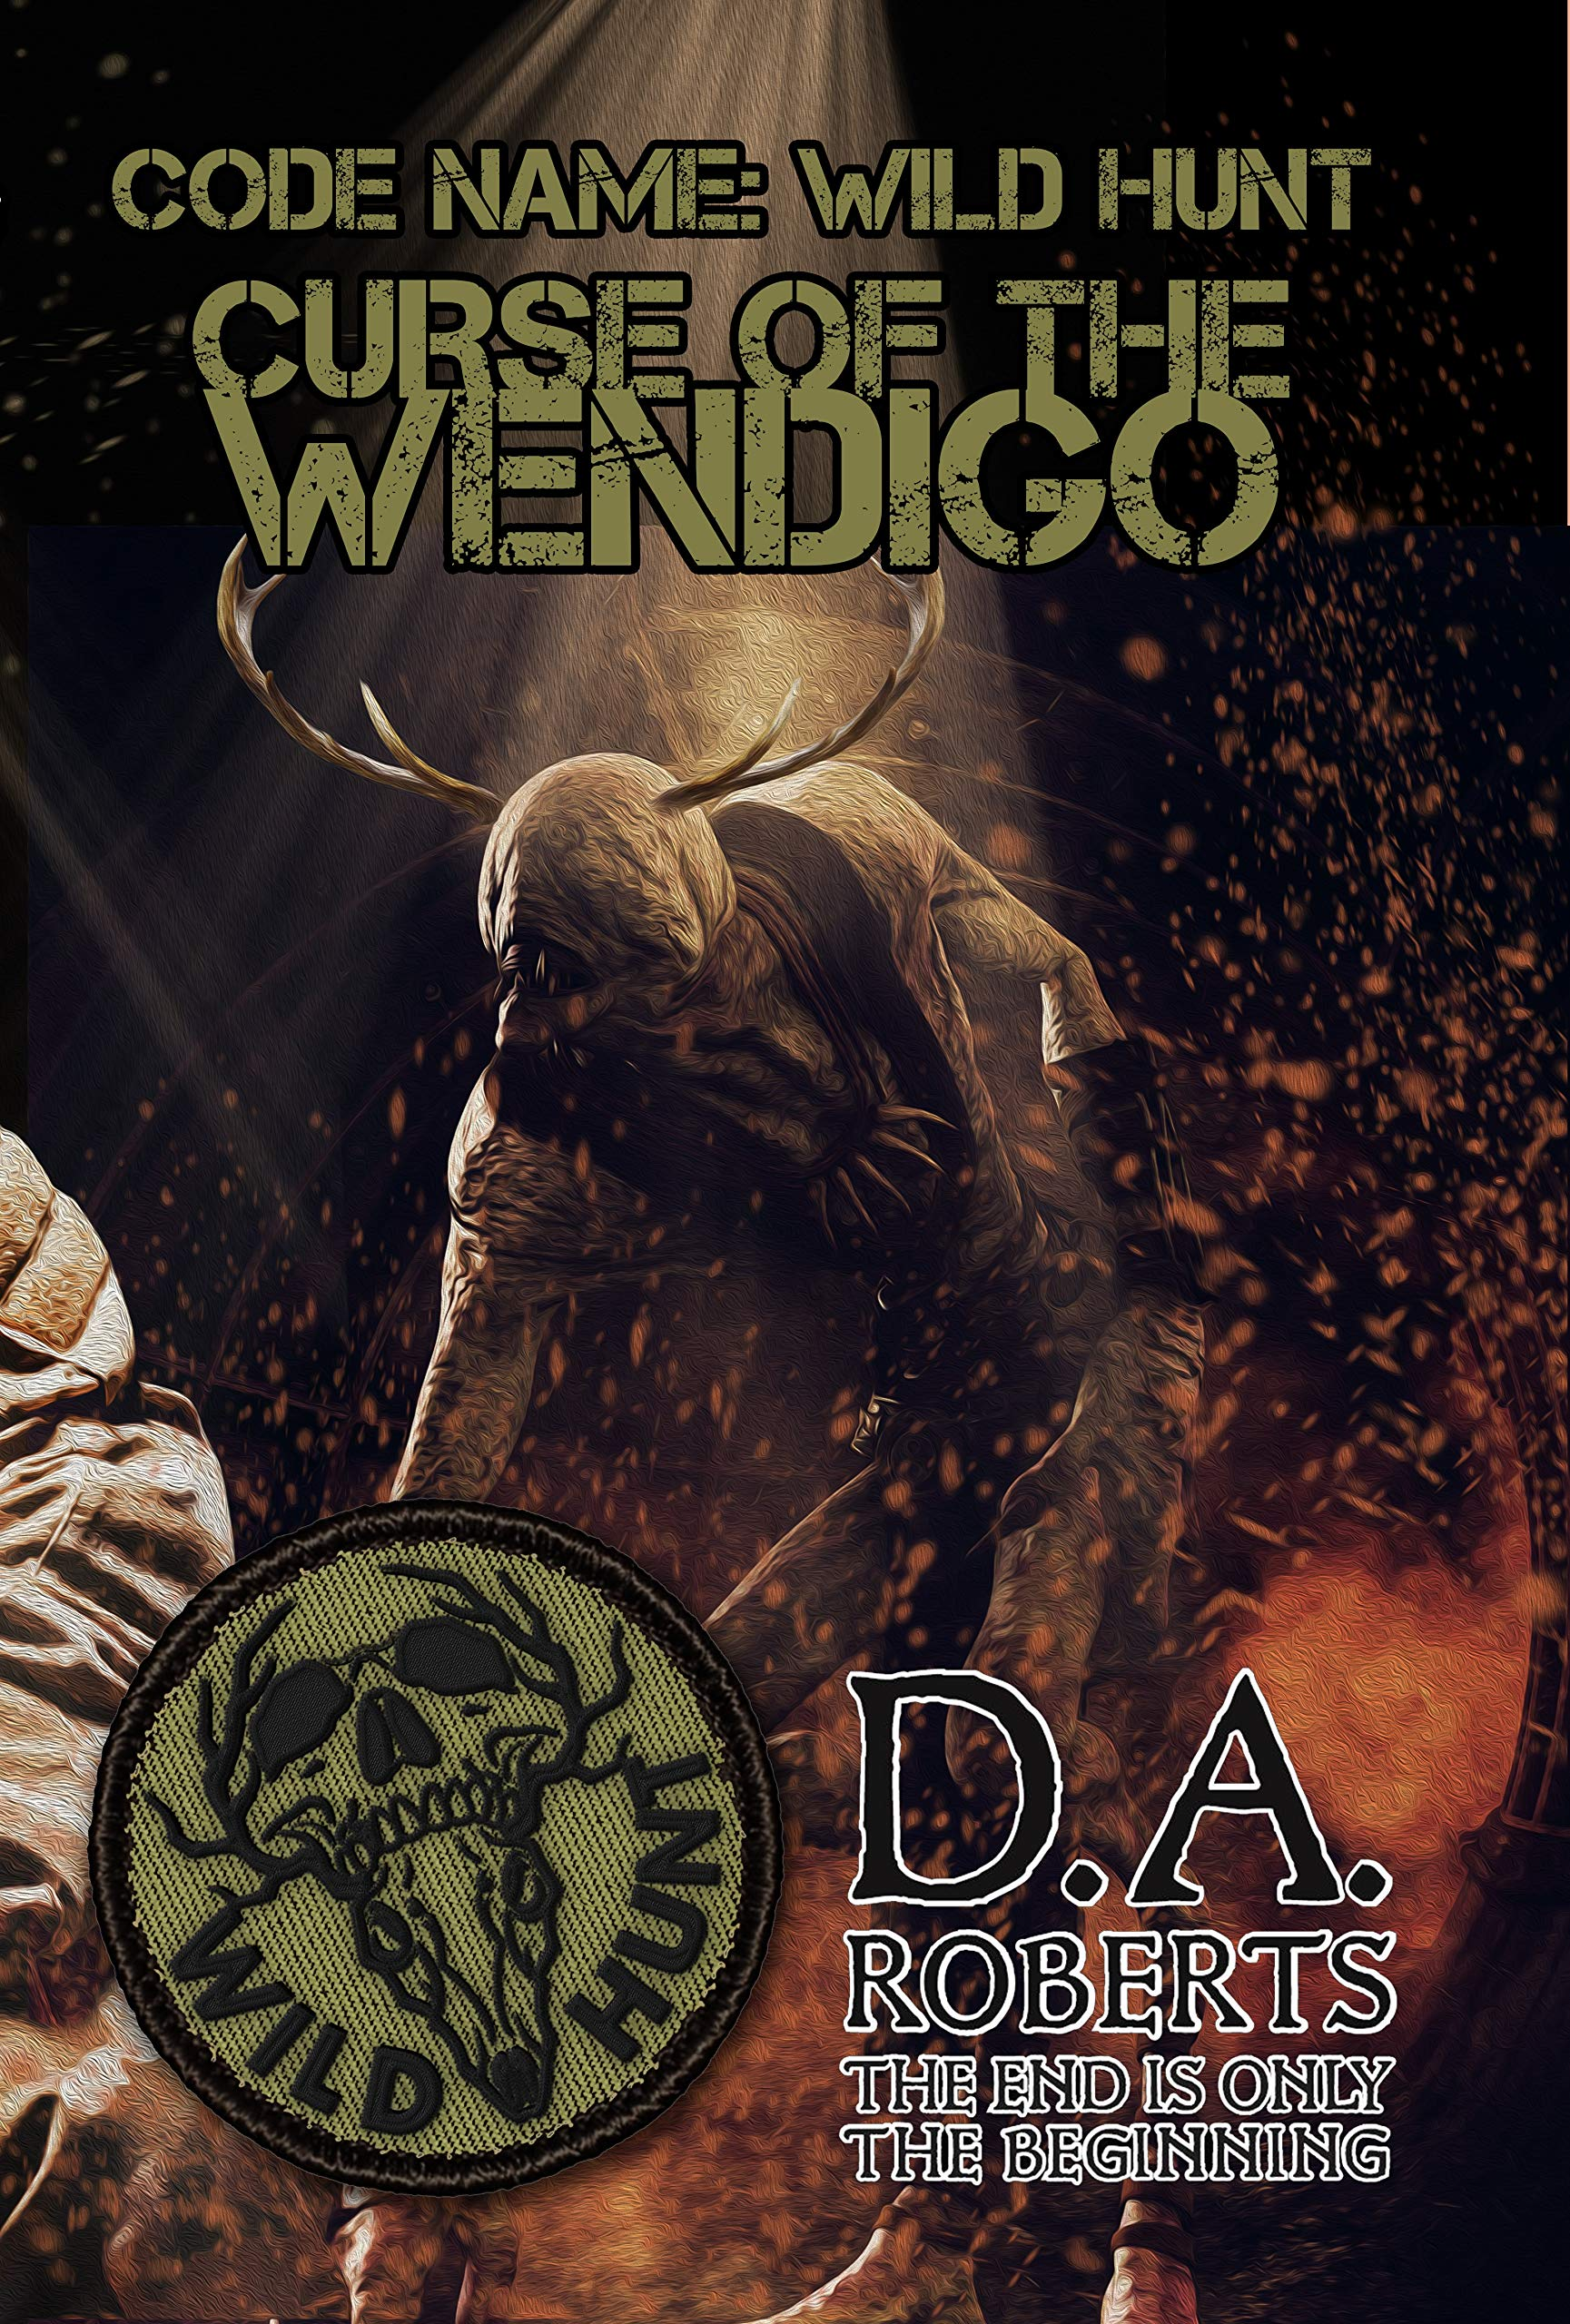 Code Name: Wild Hunt: Curse of the Wendigo